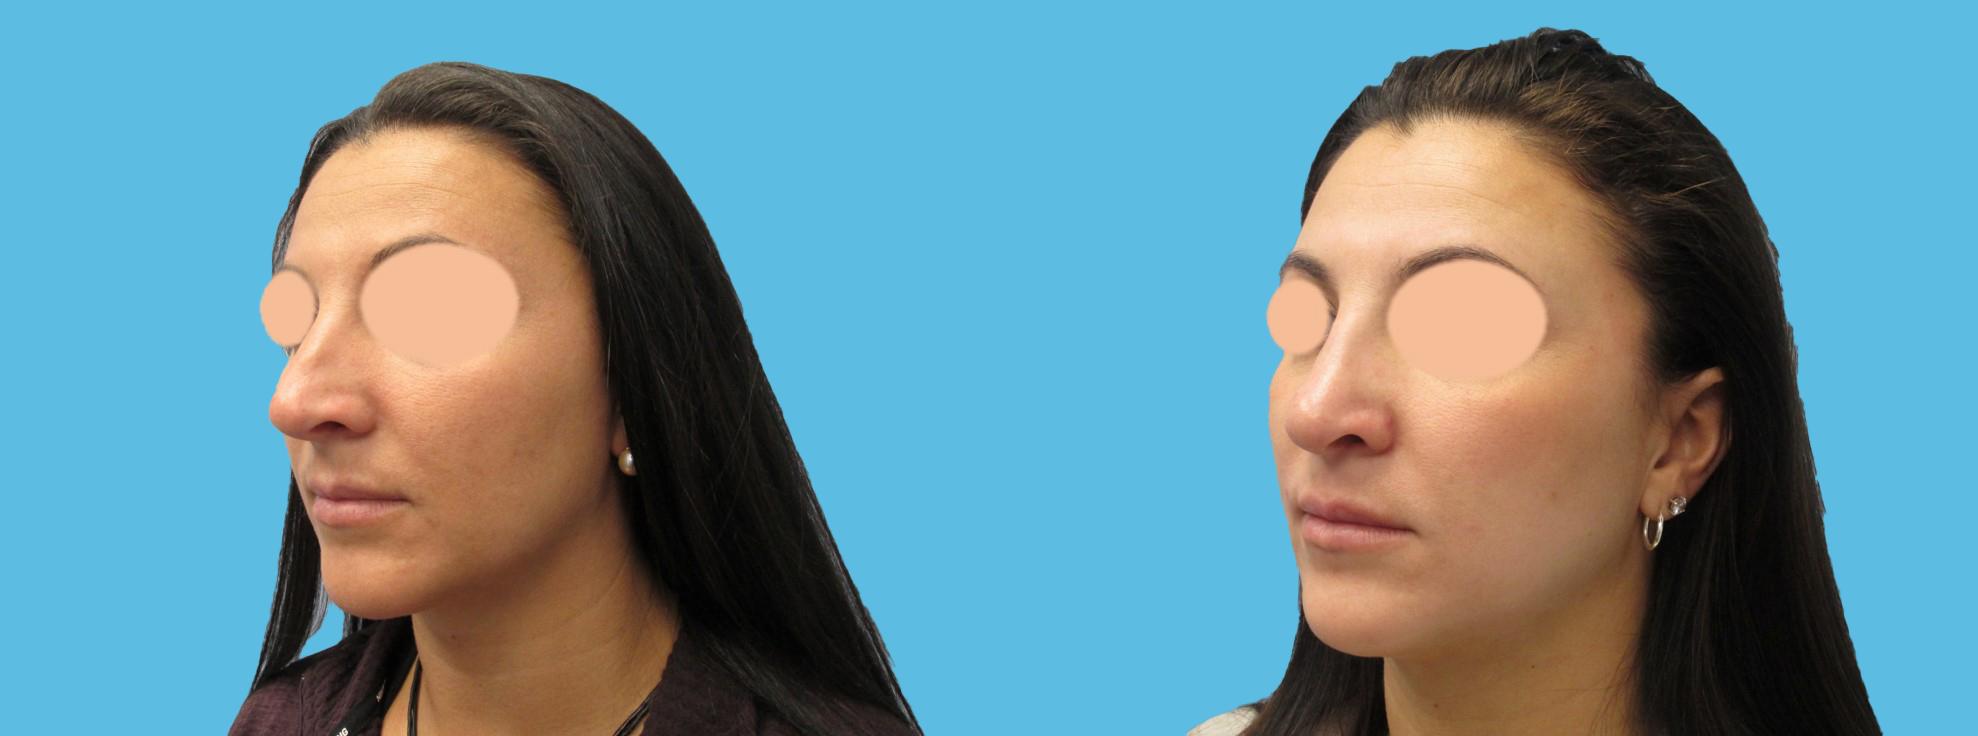 1 year rhinoplasty (severely crooked nose)